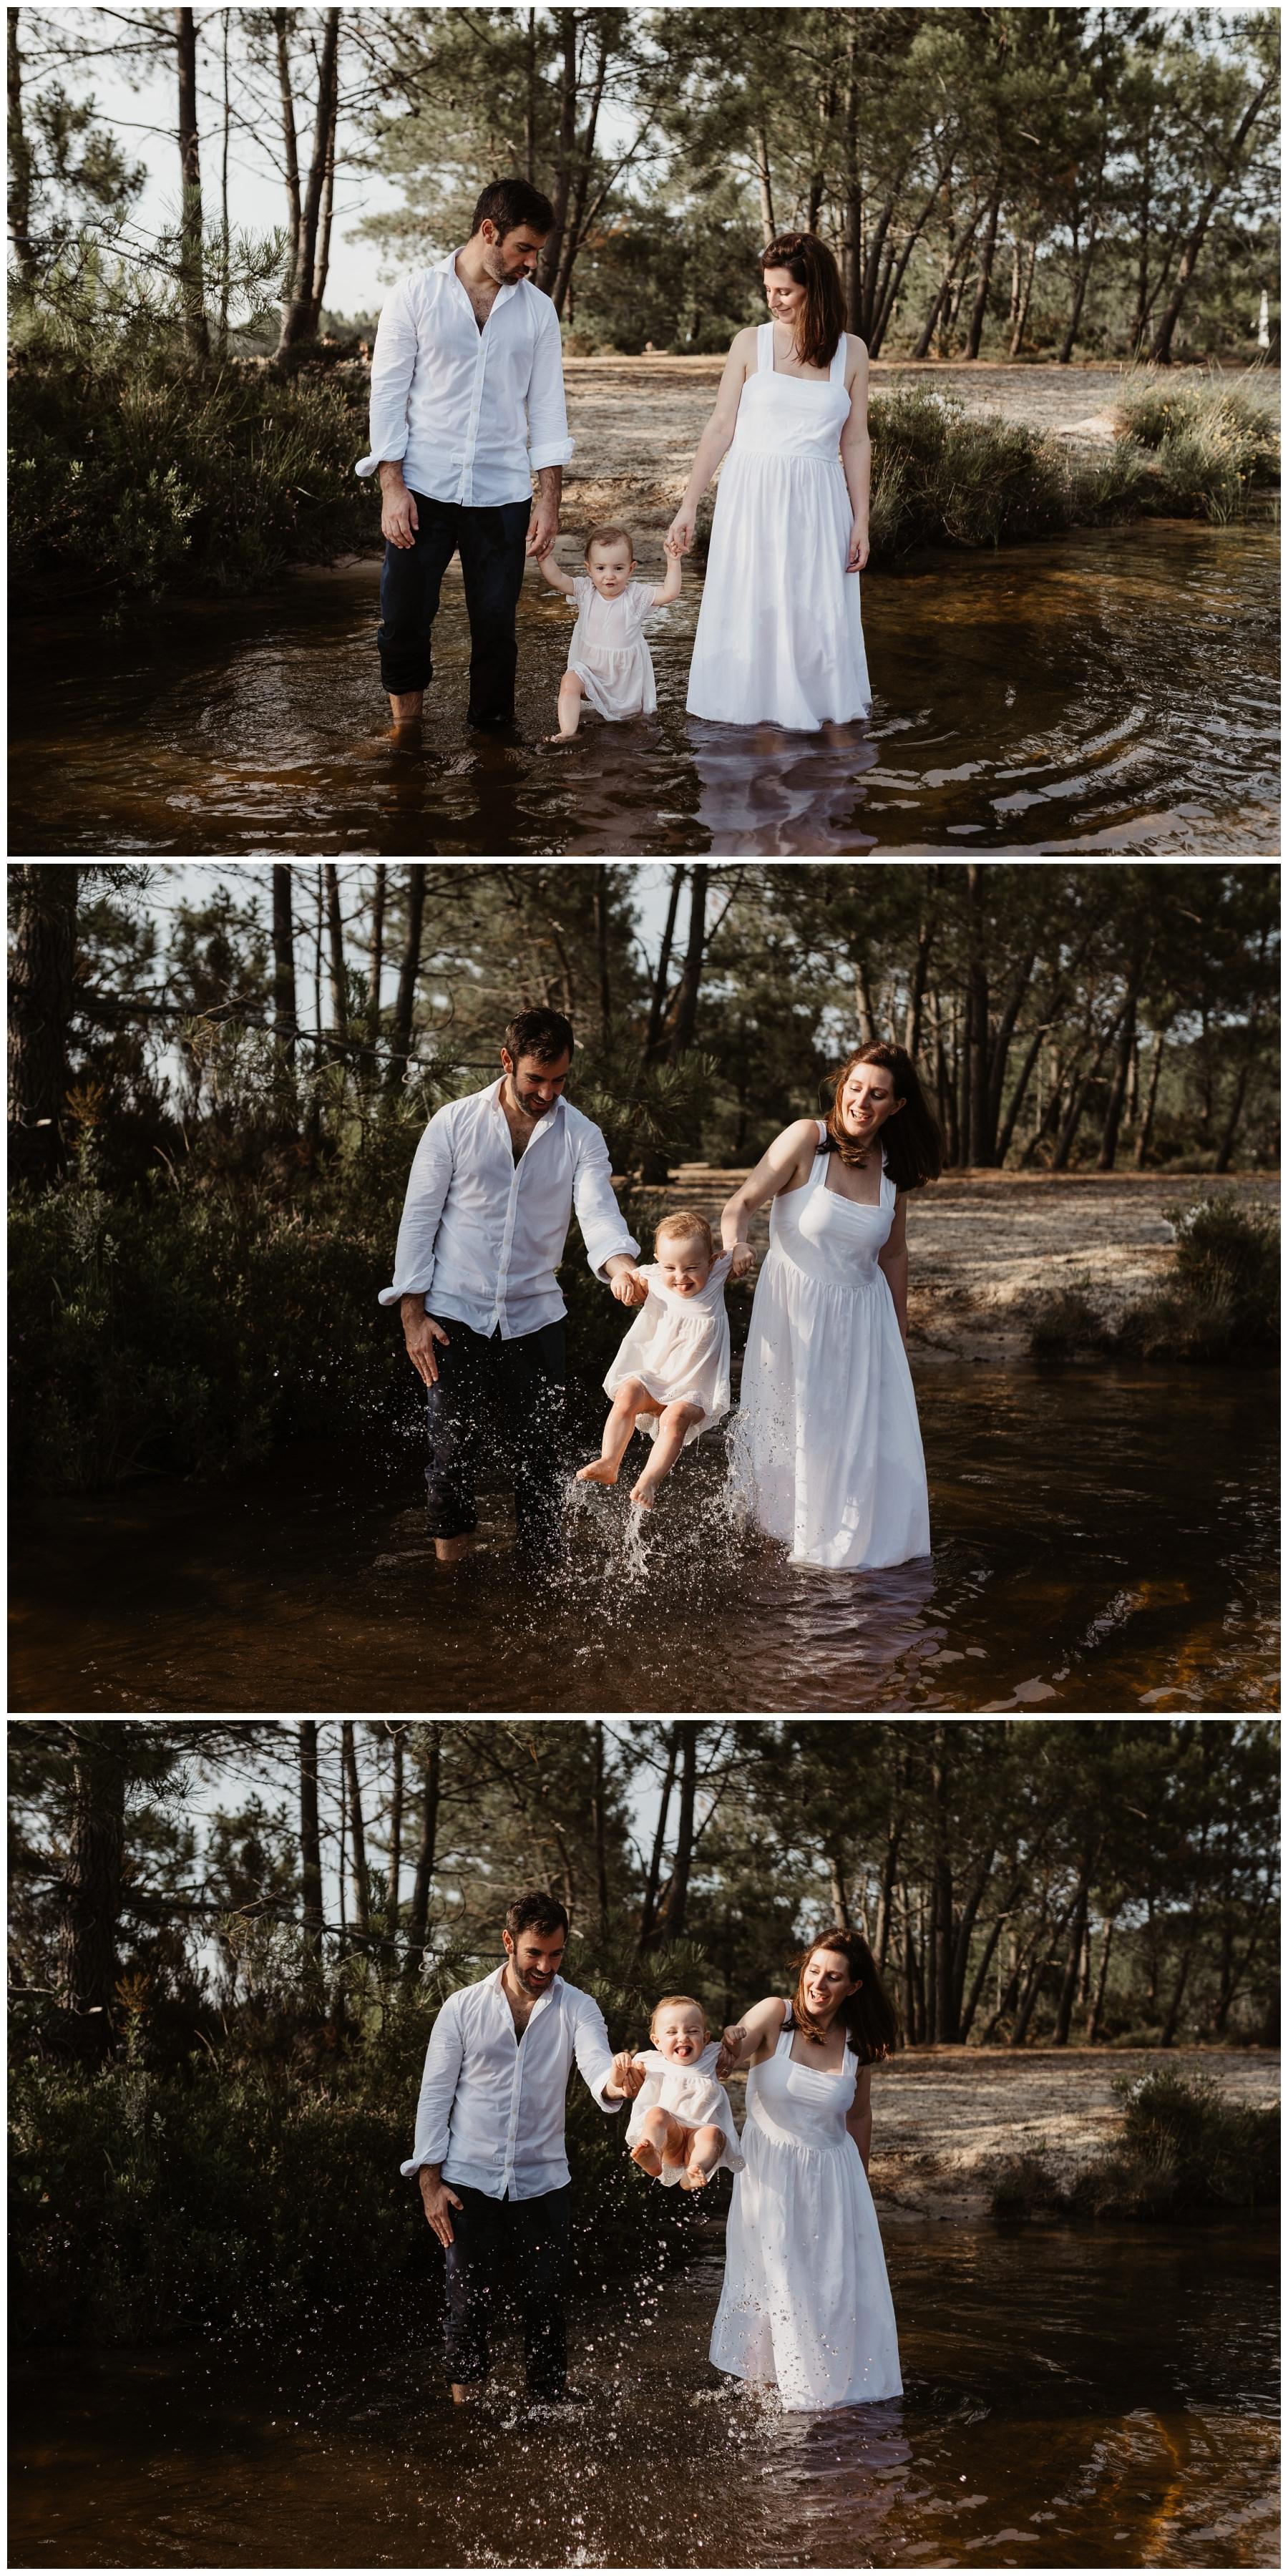 séance famille heureuse lac lacanau